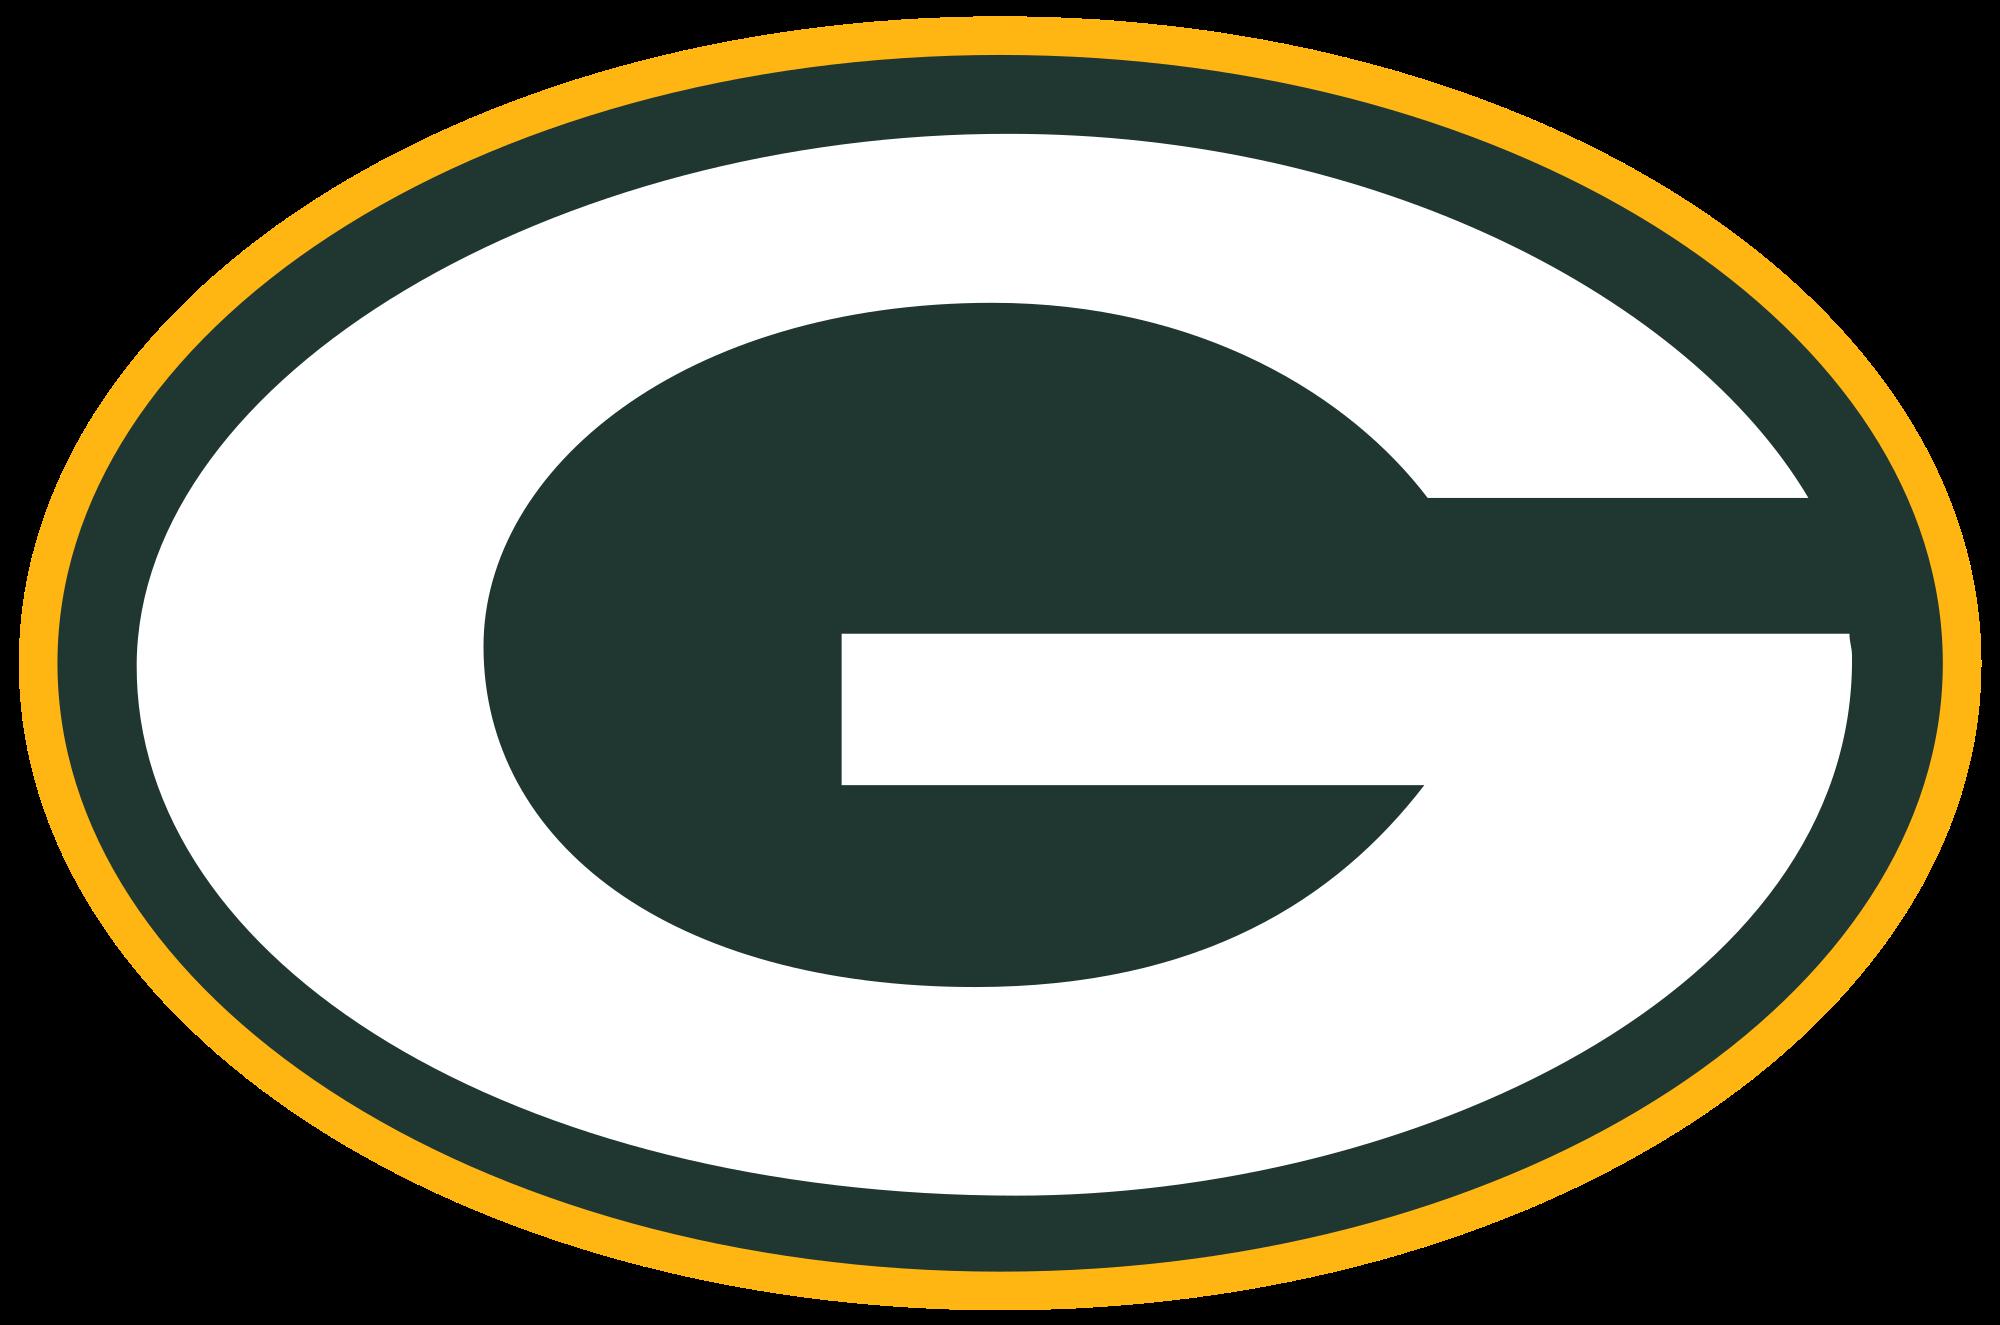 The Green Bay Packers Scorestream